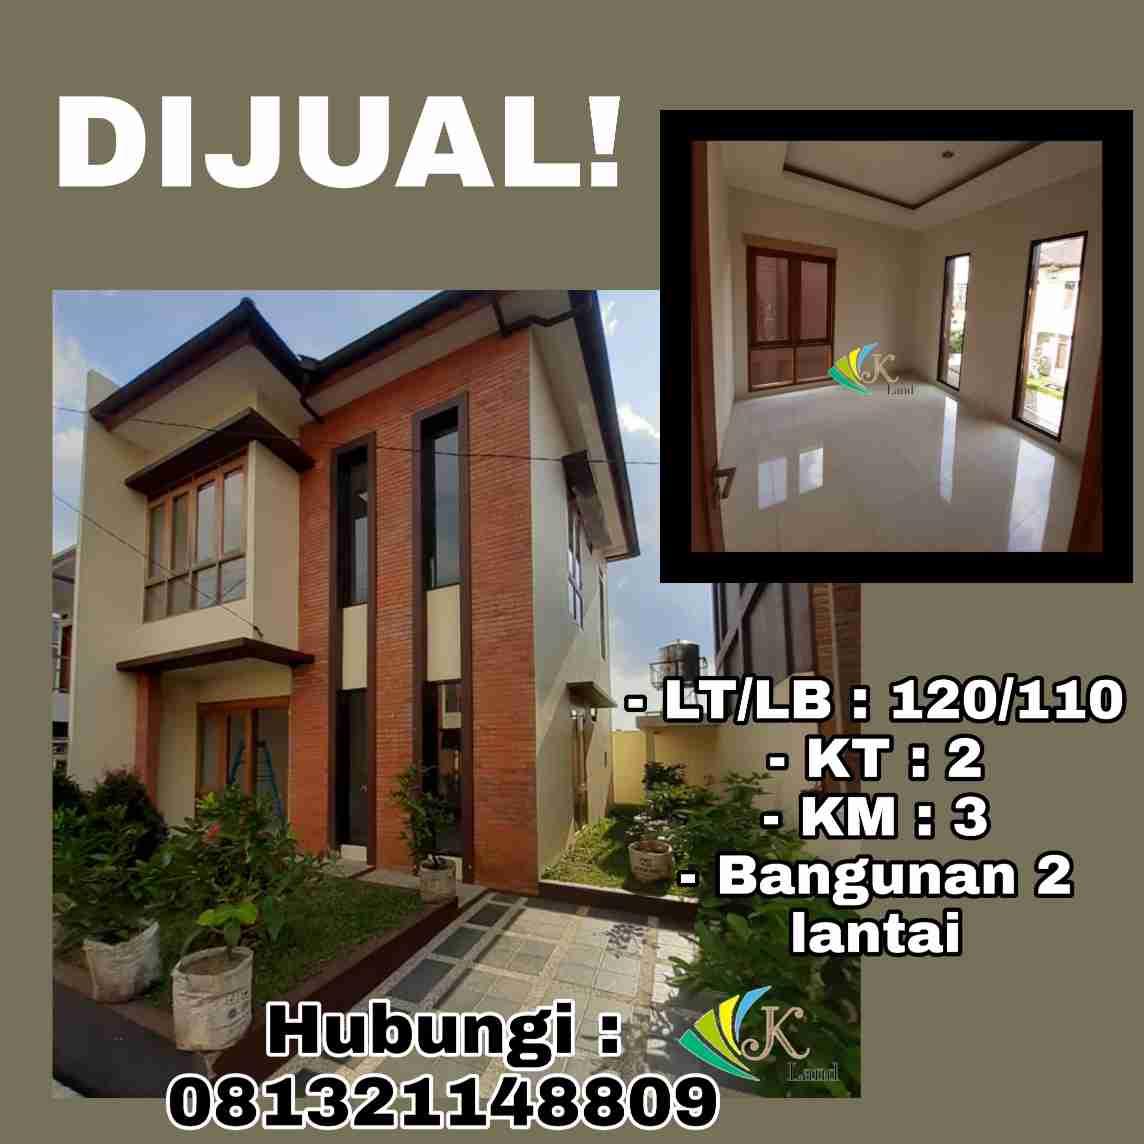 Dijual Rumah Nyaman Bandung